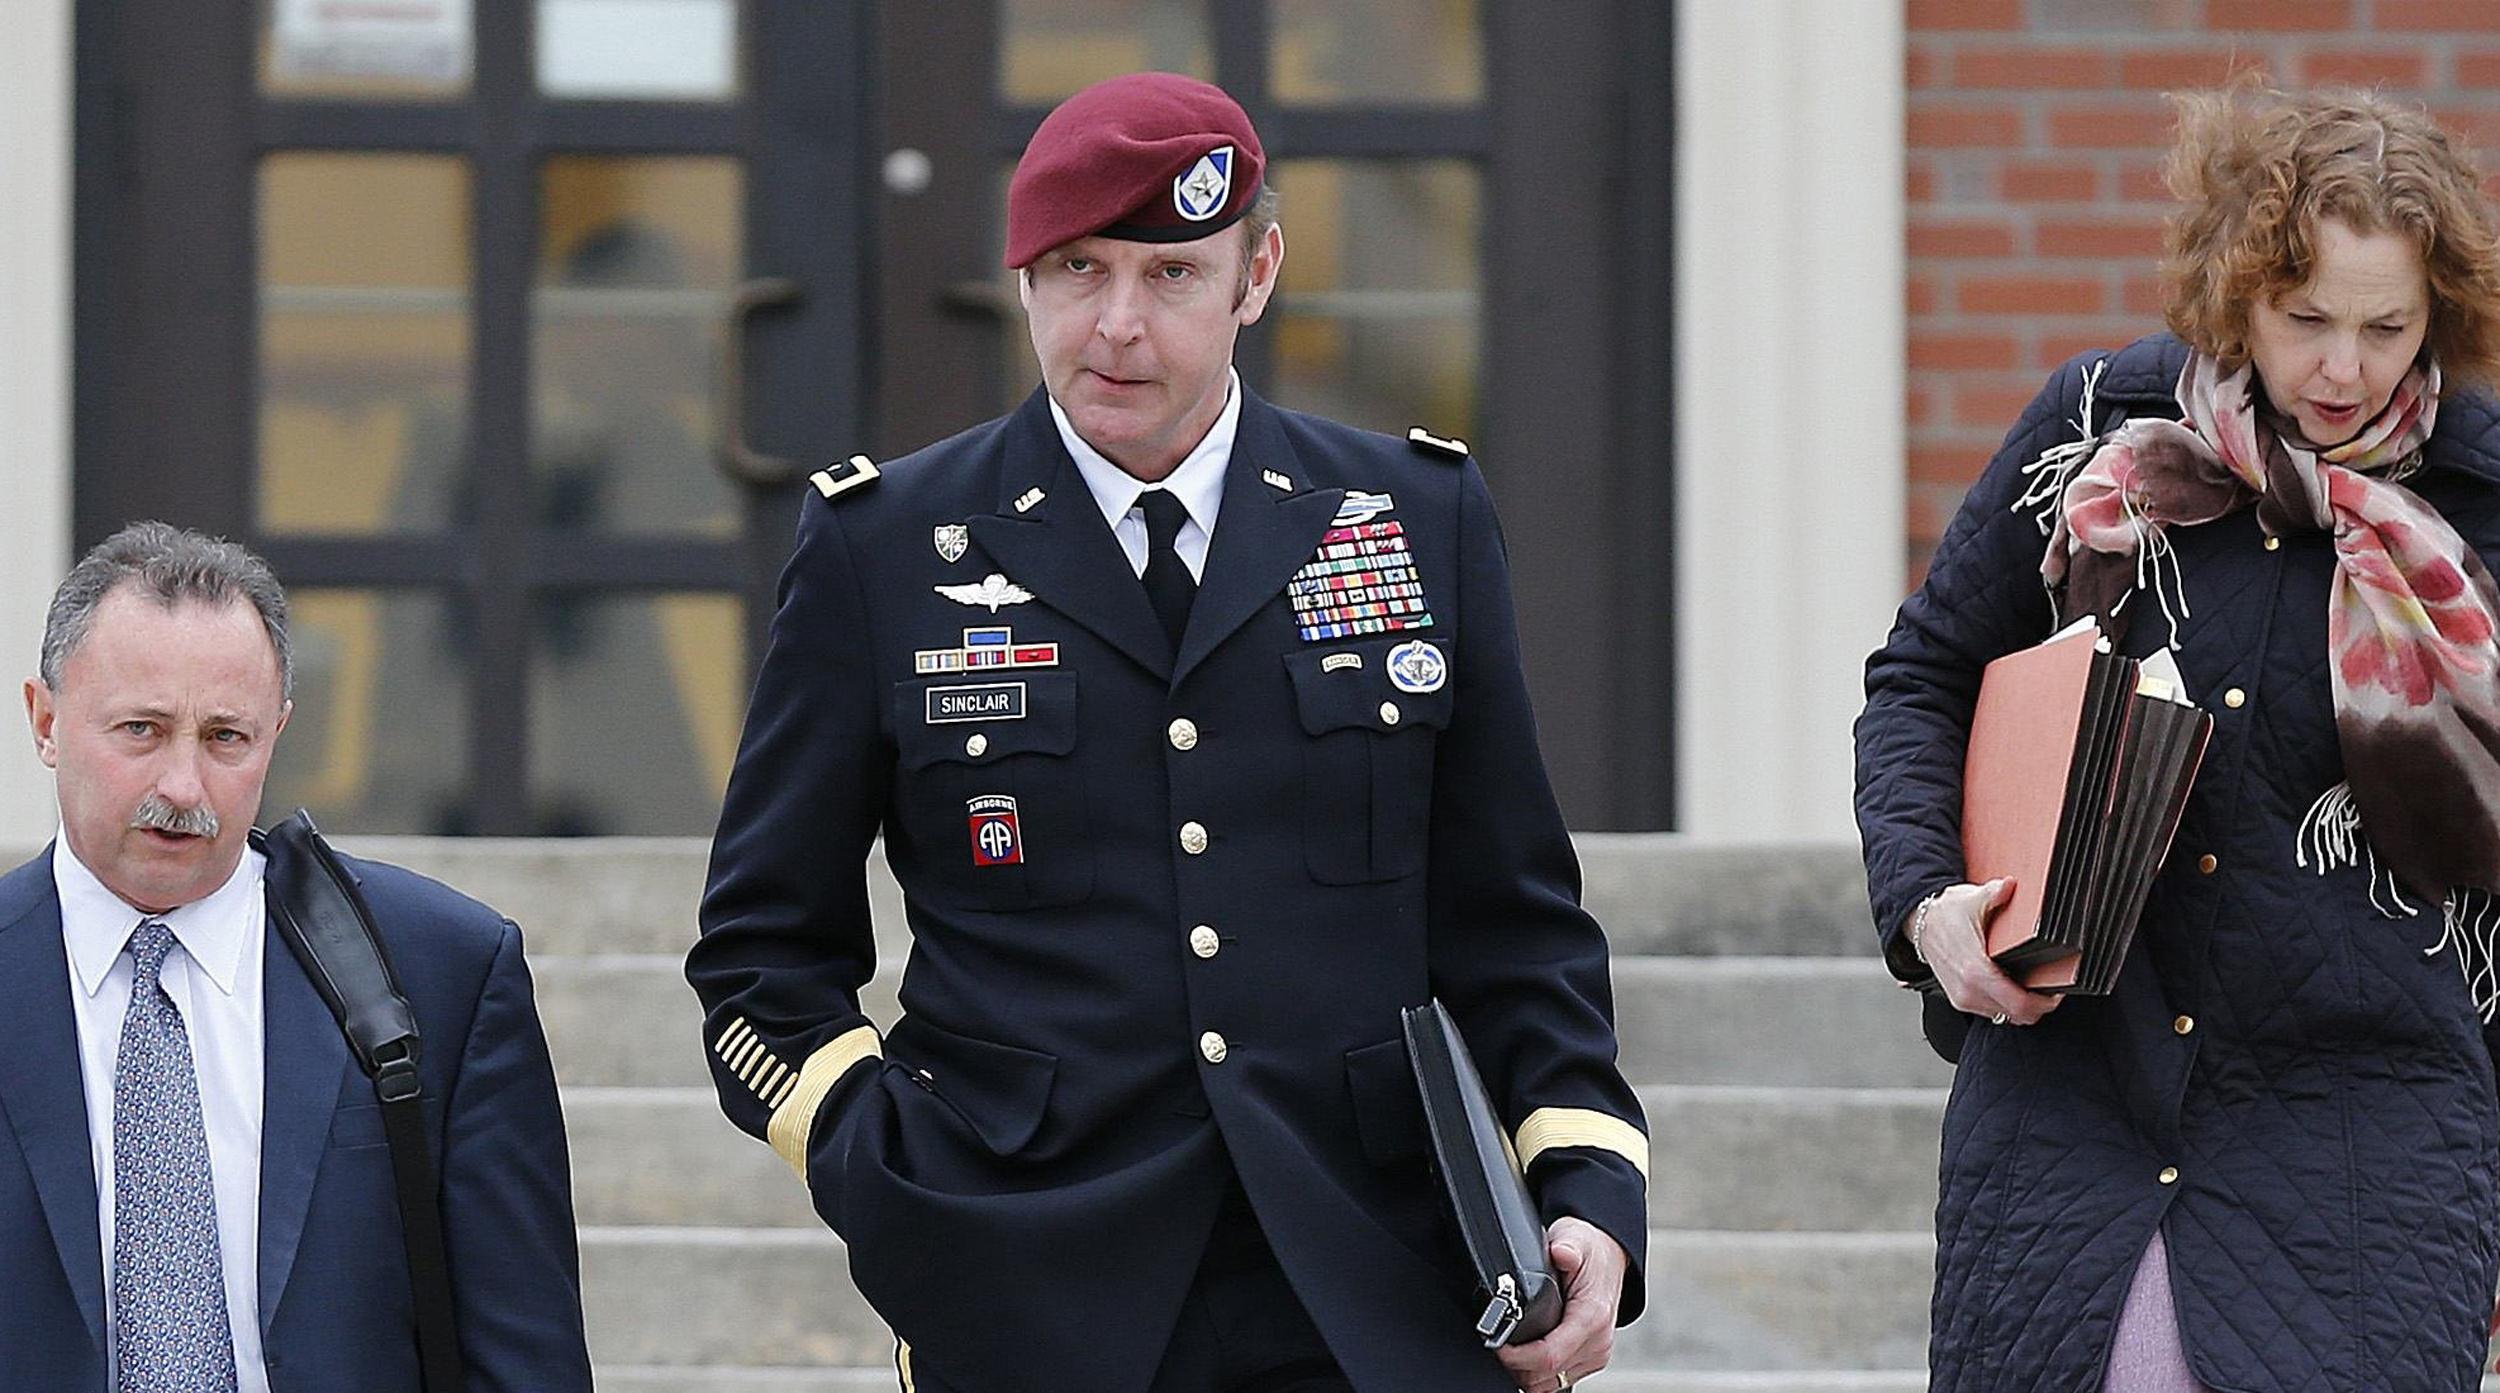 Image: Army Brigadier General Jeffrey Sinclair